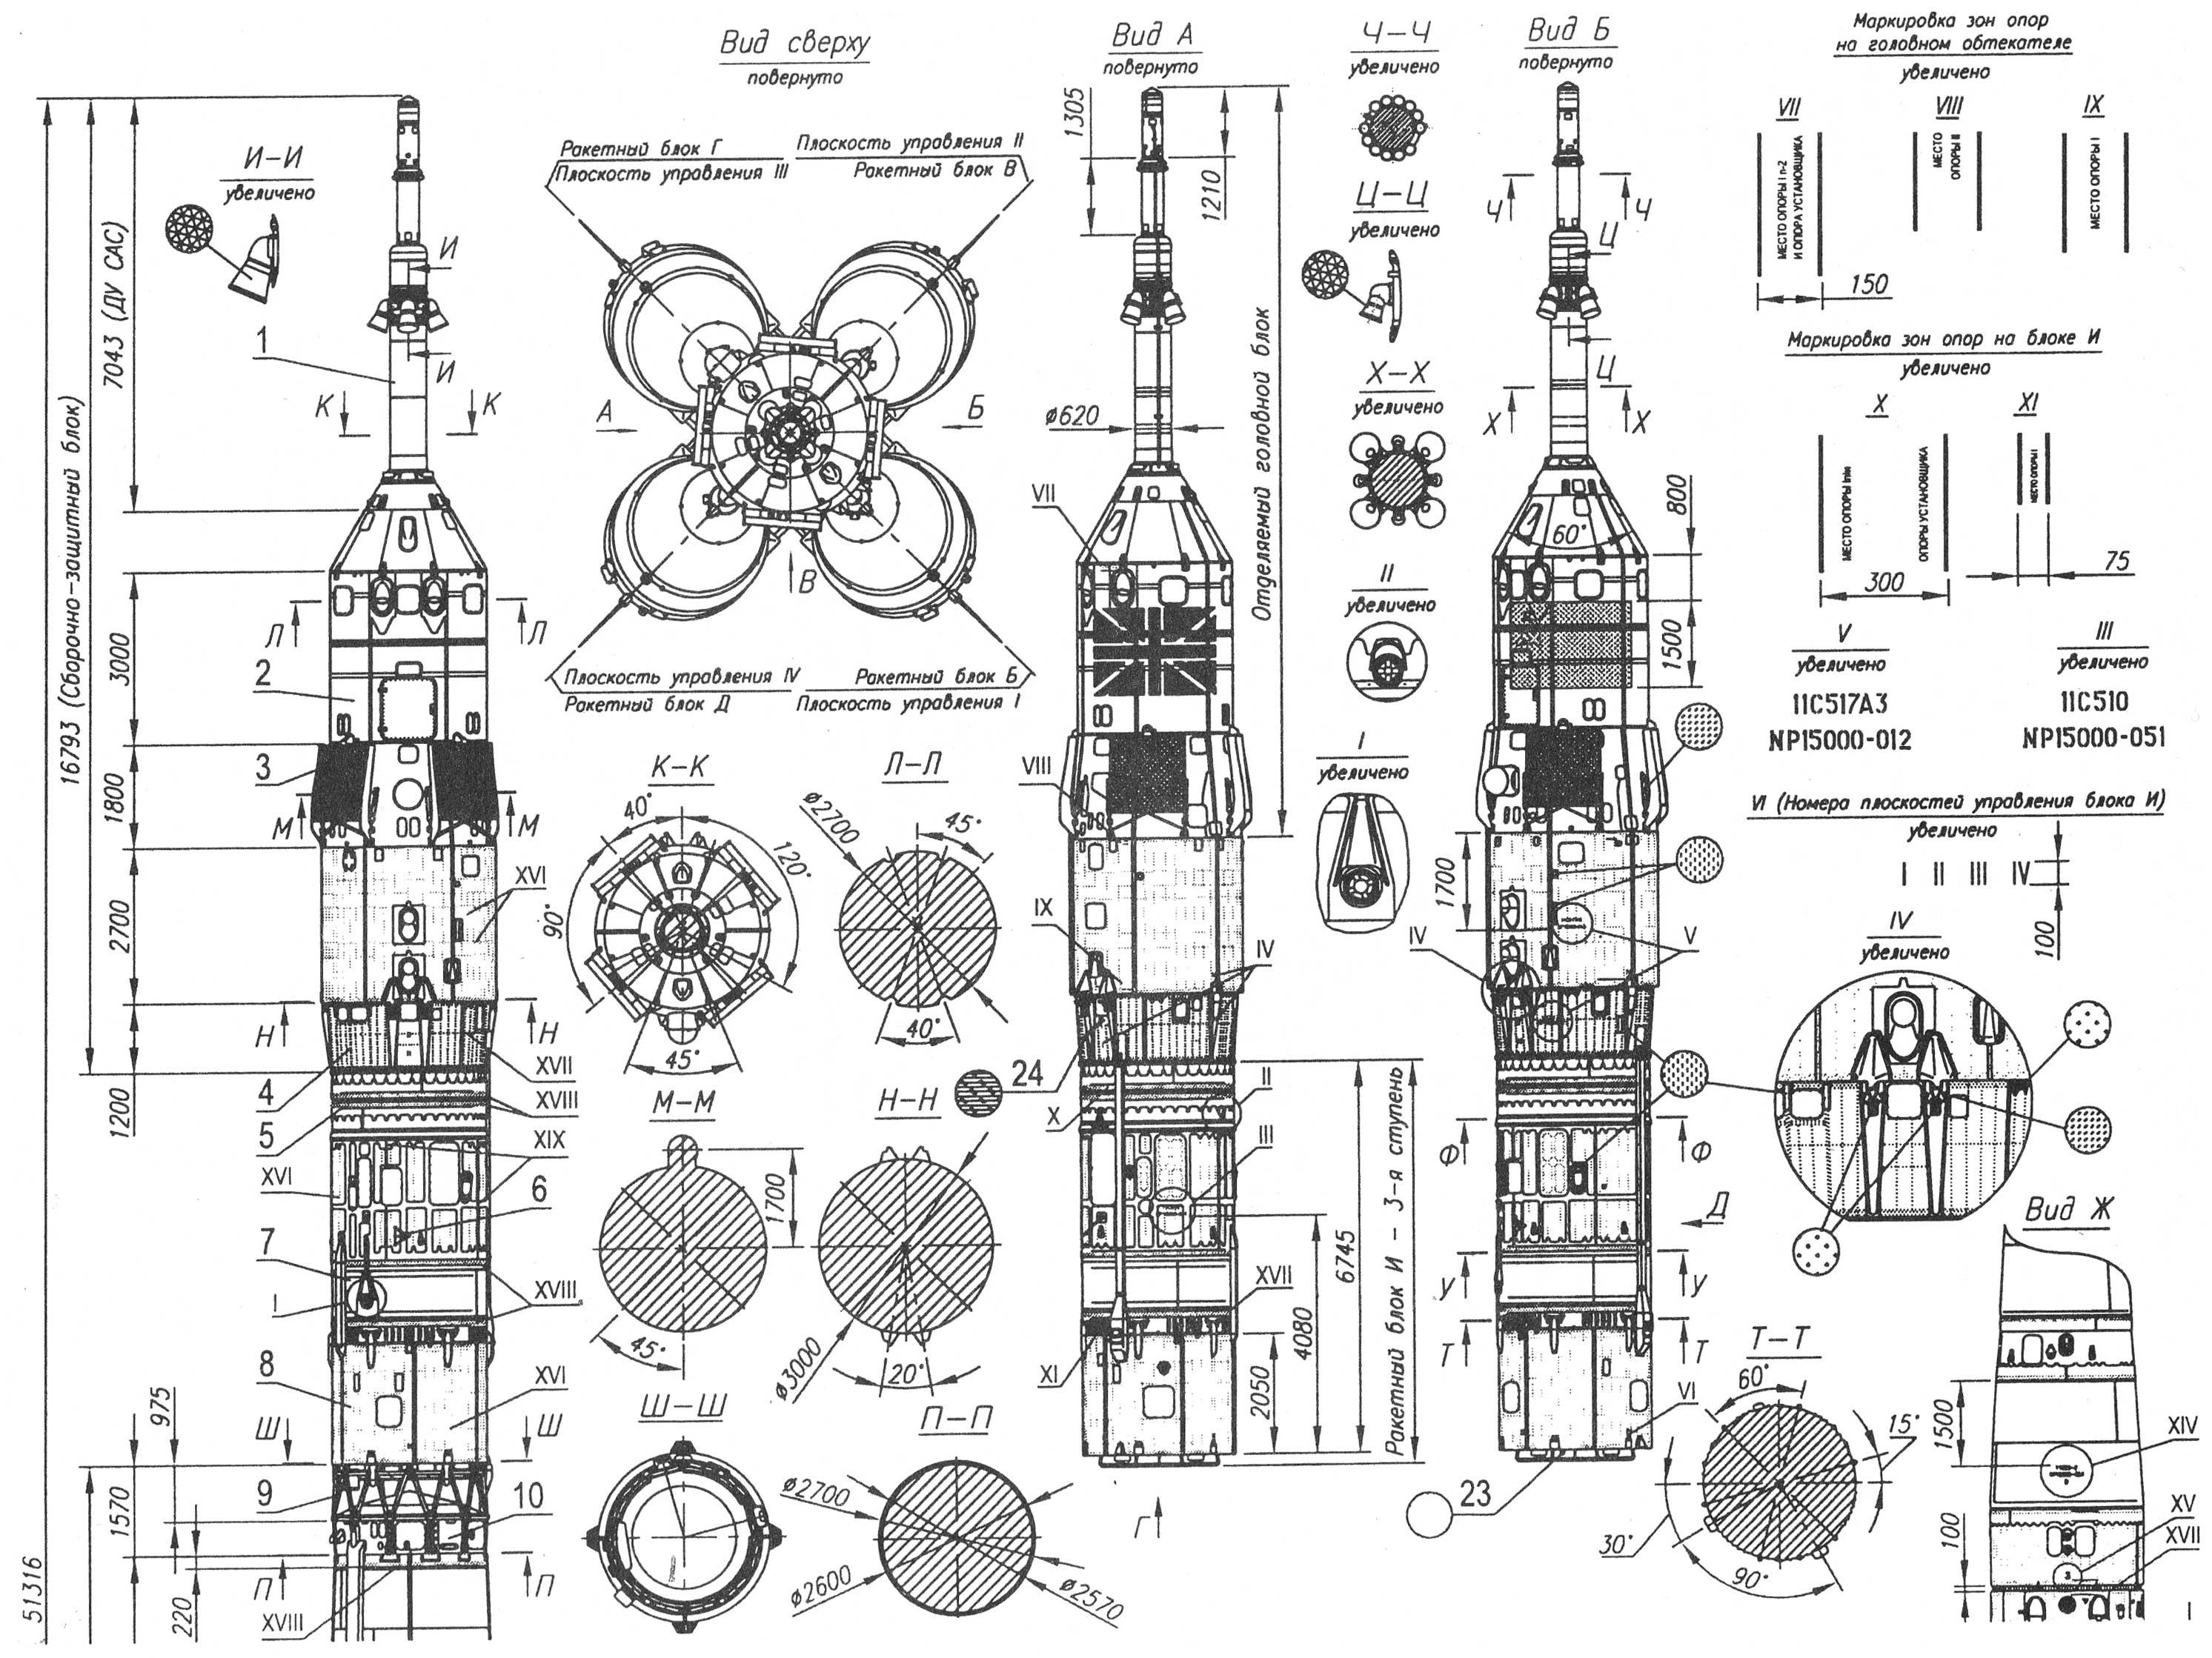 parts of the apollo spacecraft